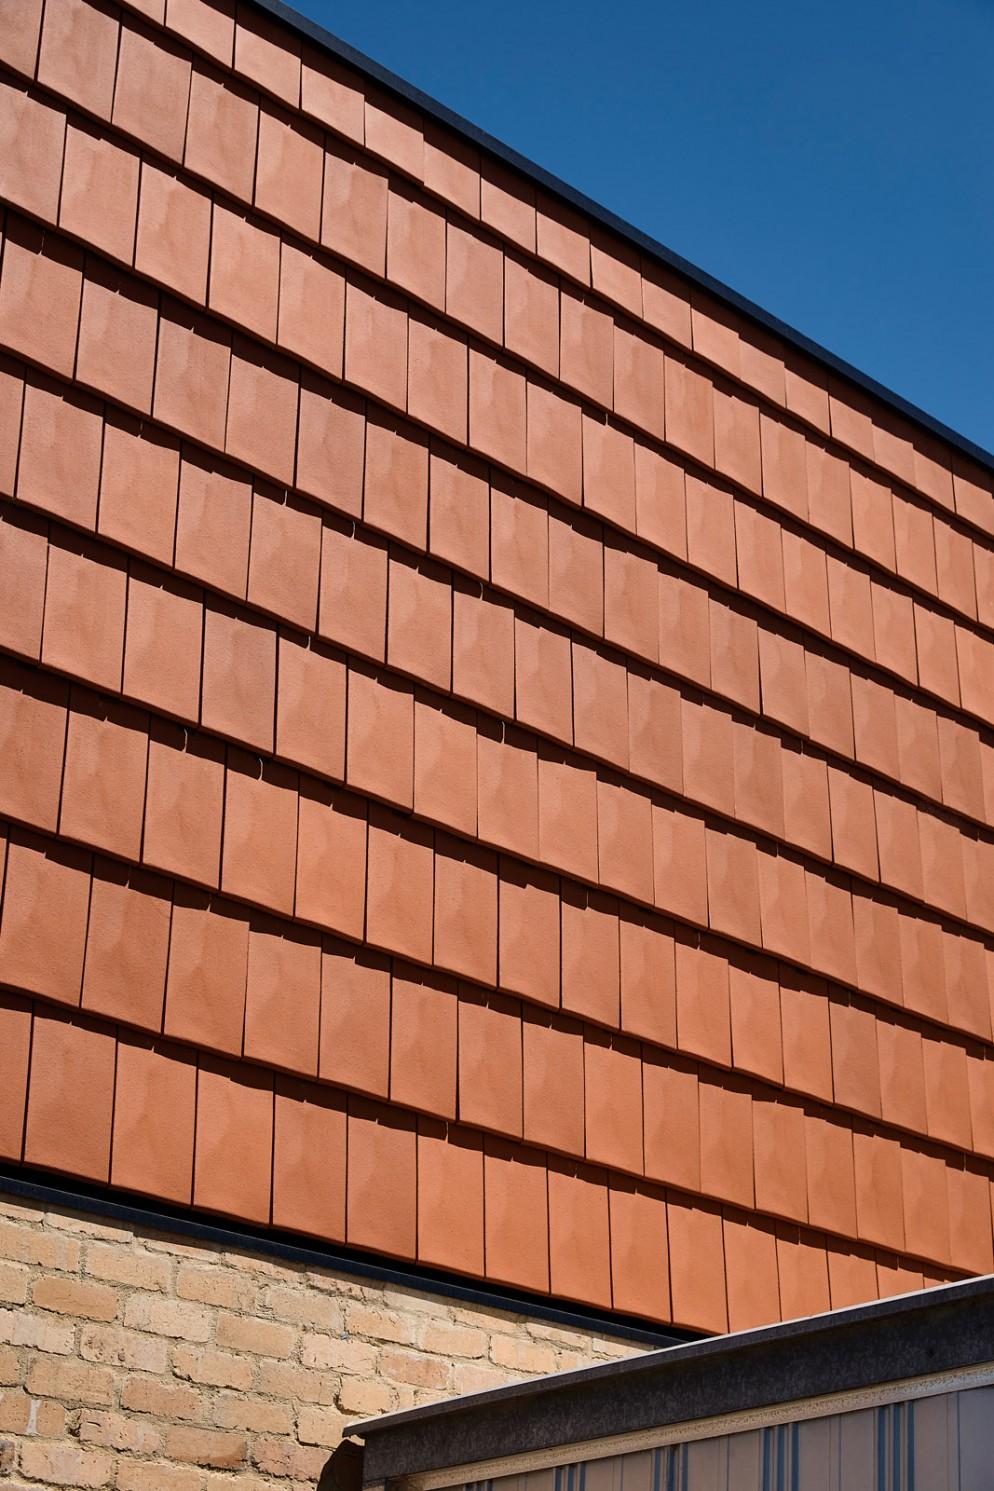 04 AMA-Terracotta_House_Derek_Swalwell